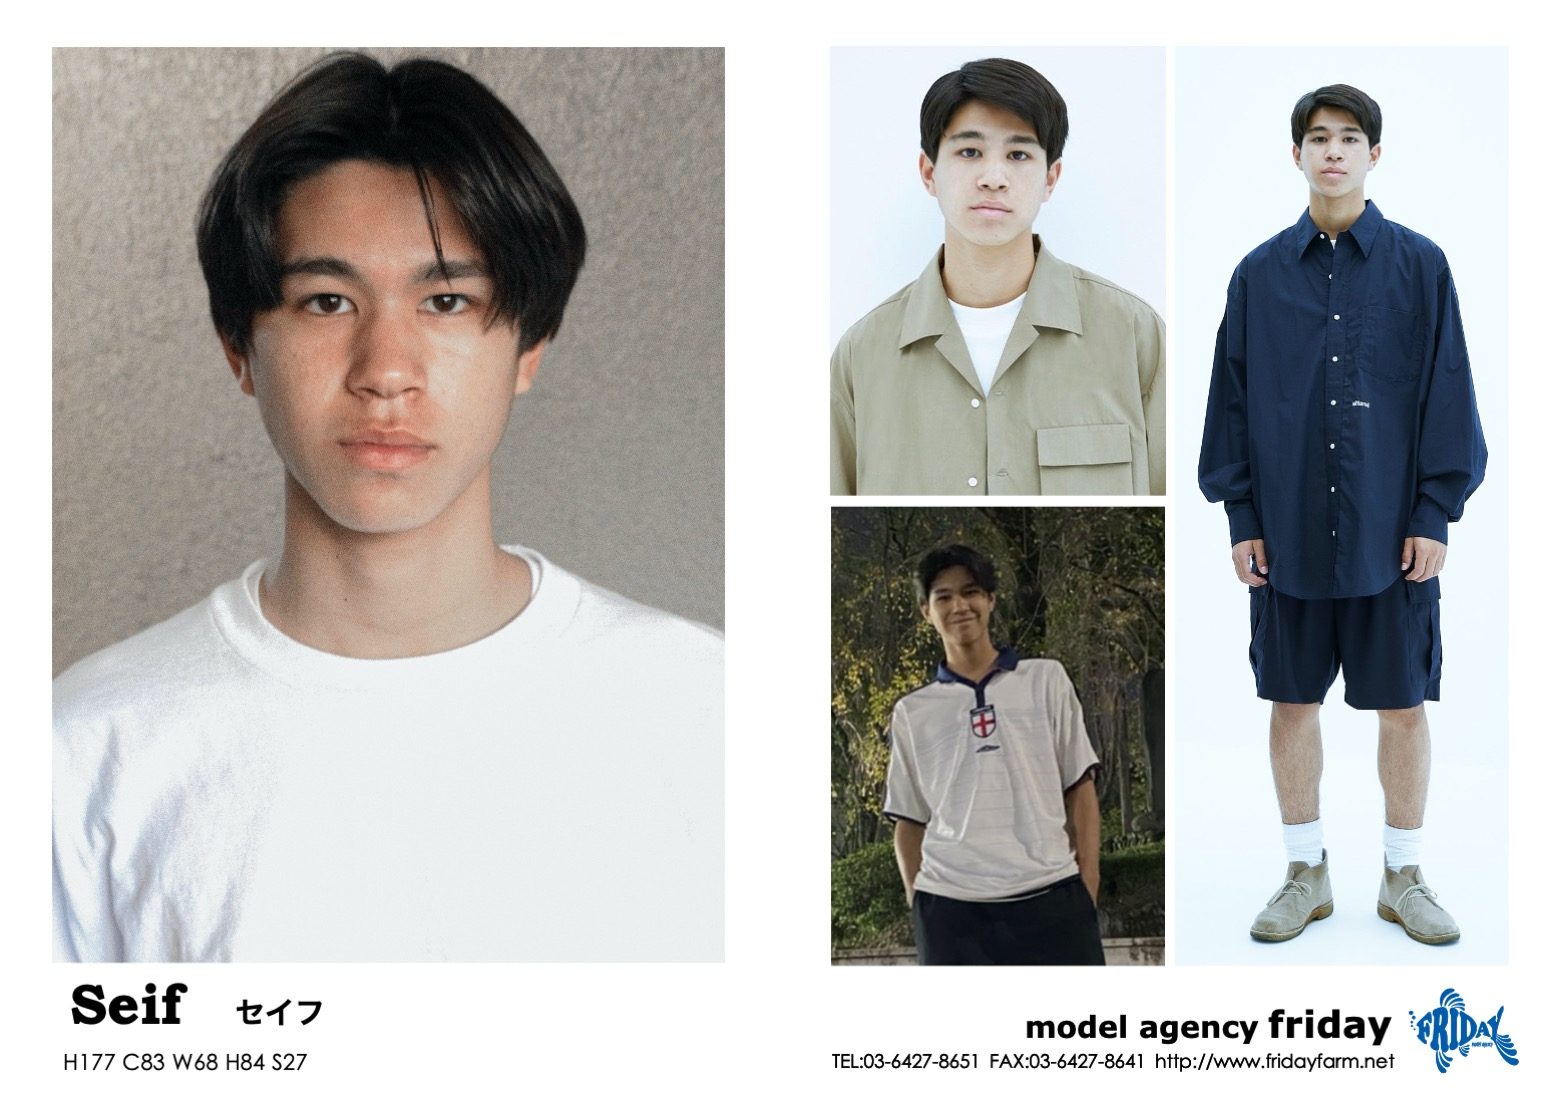 Seif - セイフ   model agency friday